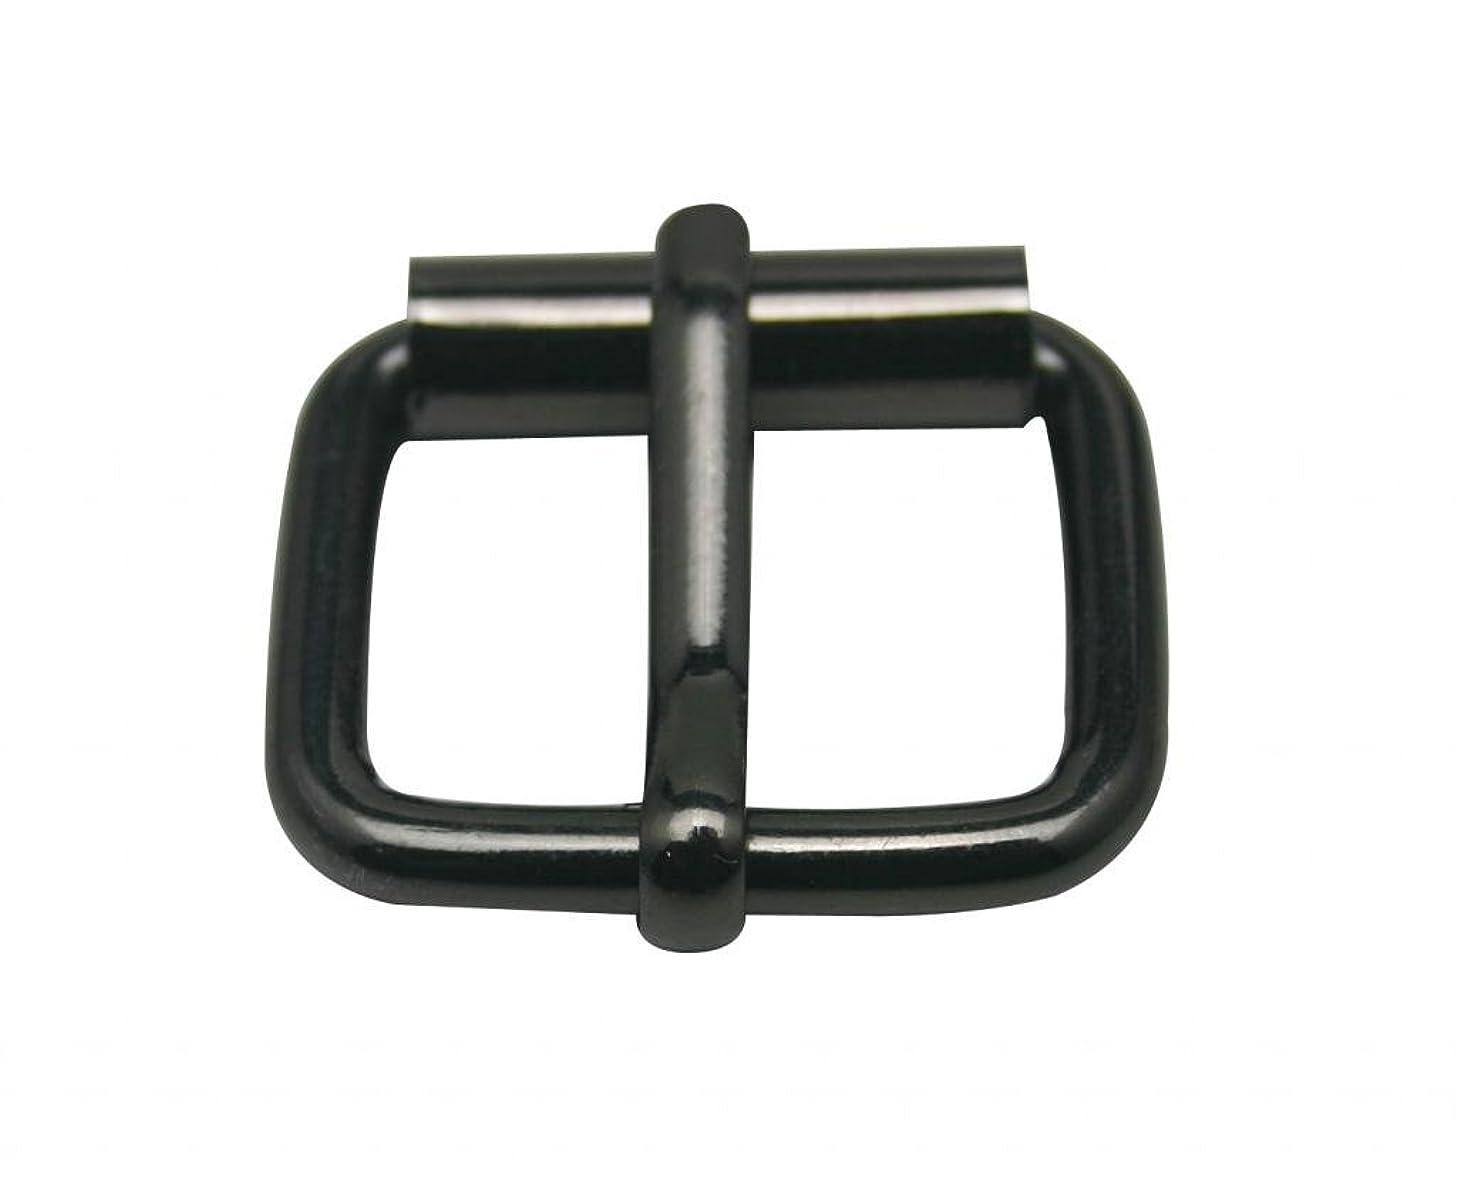 Generic Metal Gun Black Rectangle Buckle with Slider Bar 1